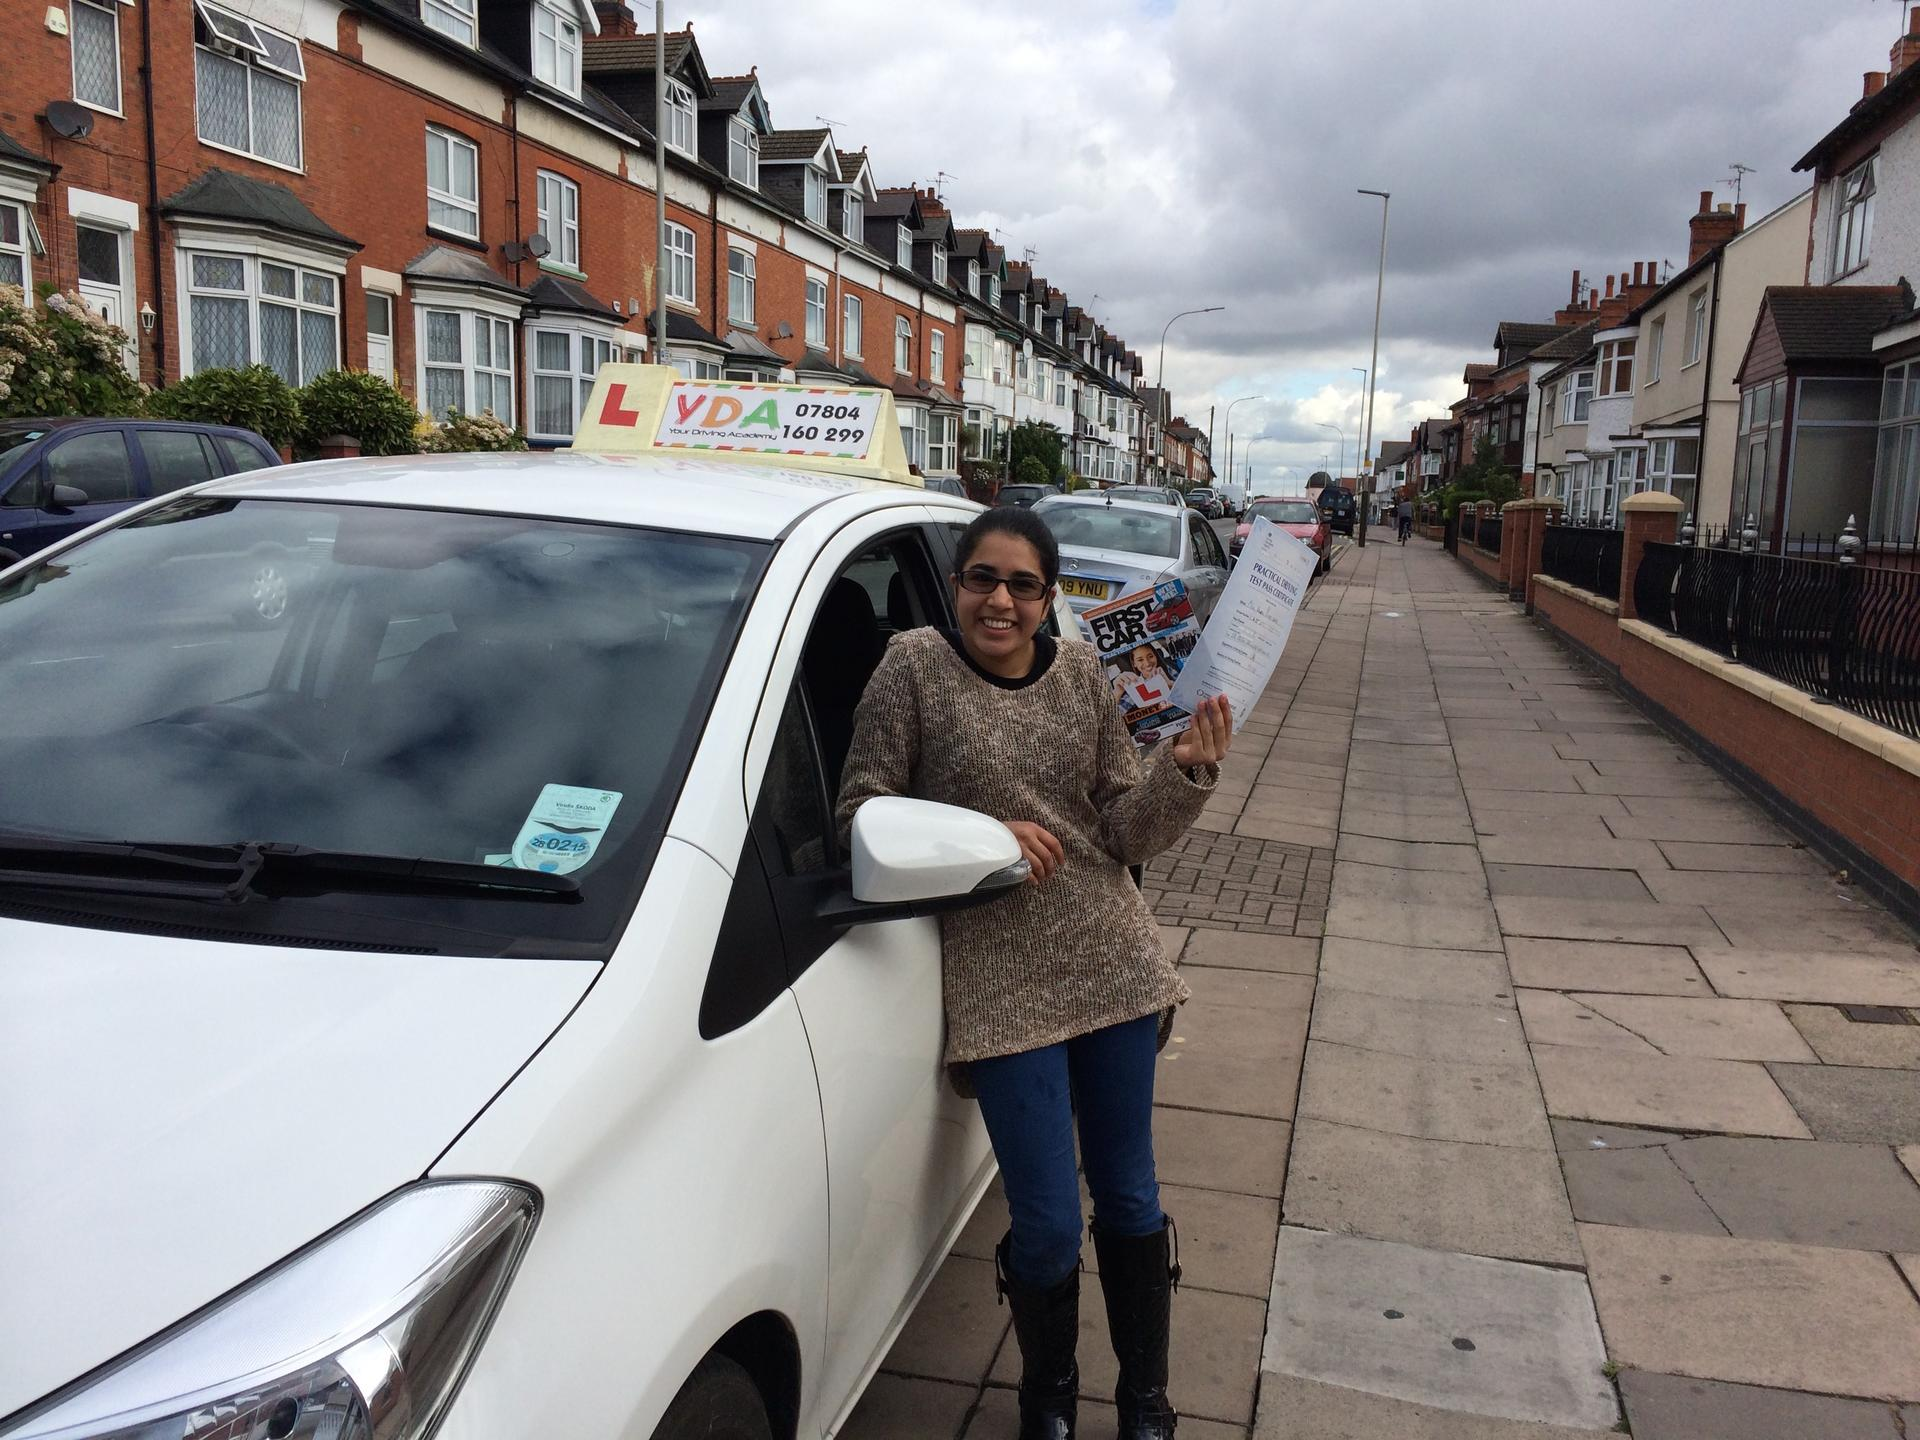 Driving Schools Leicester - Raeesa Khatri